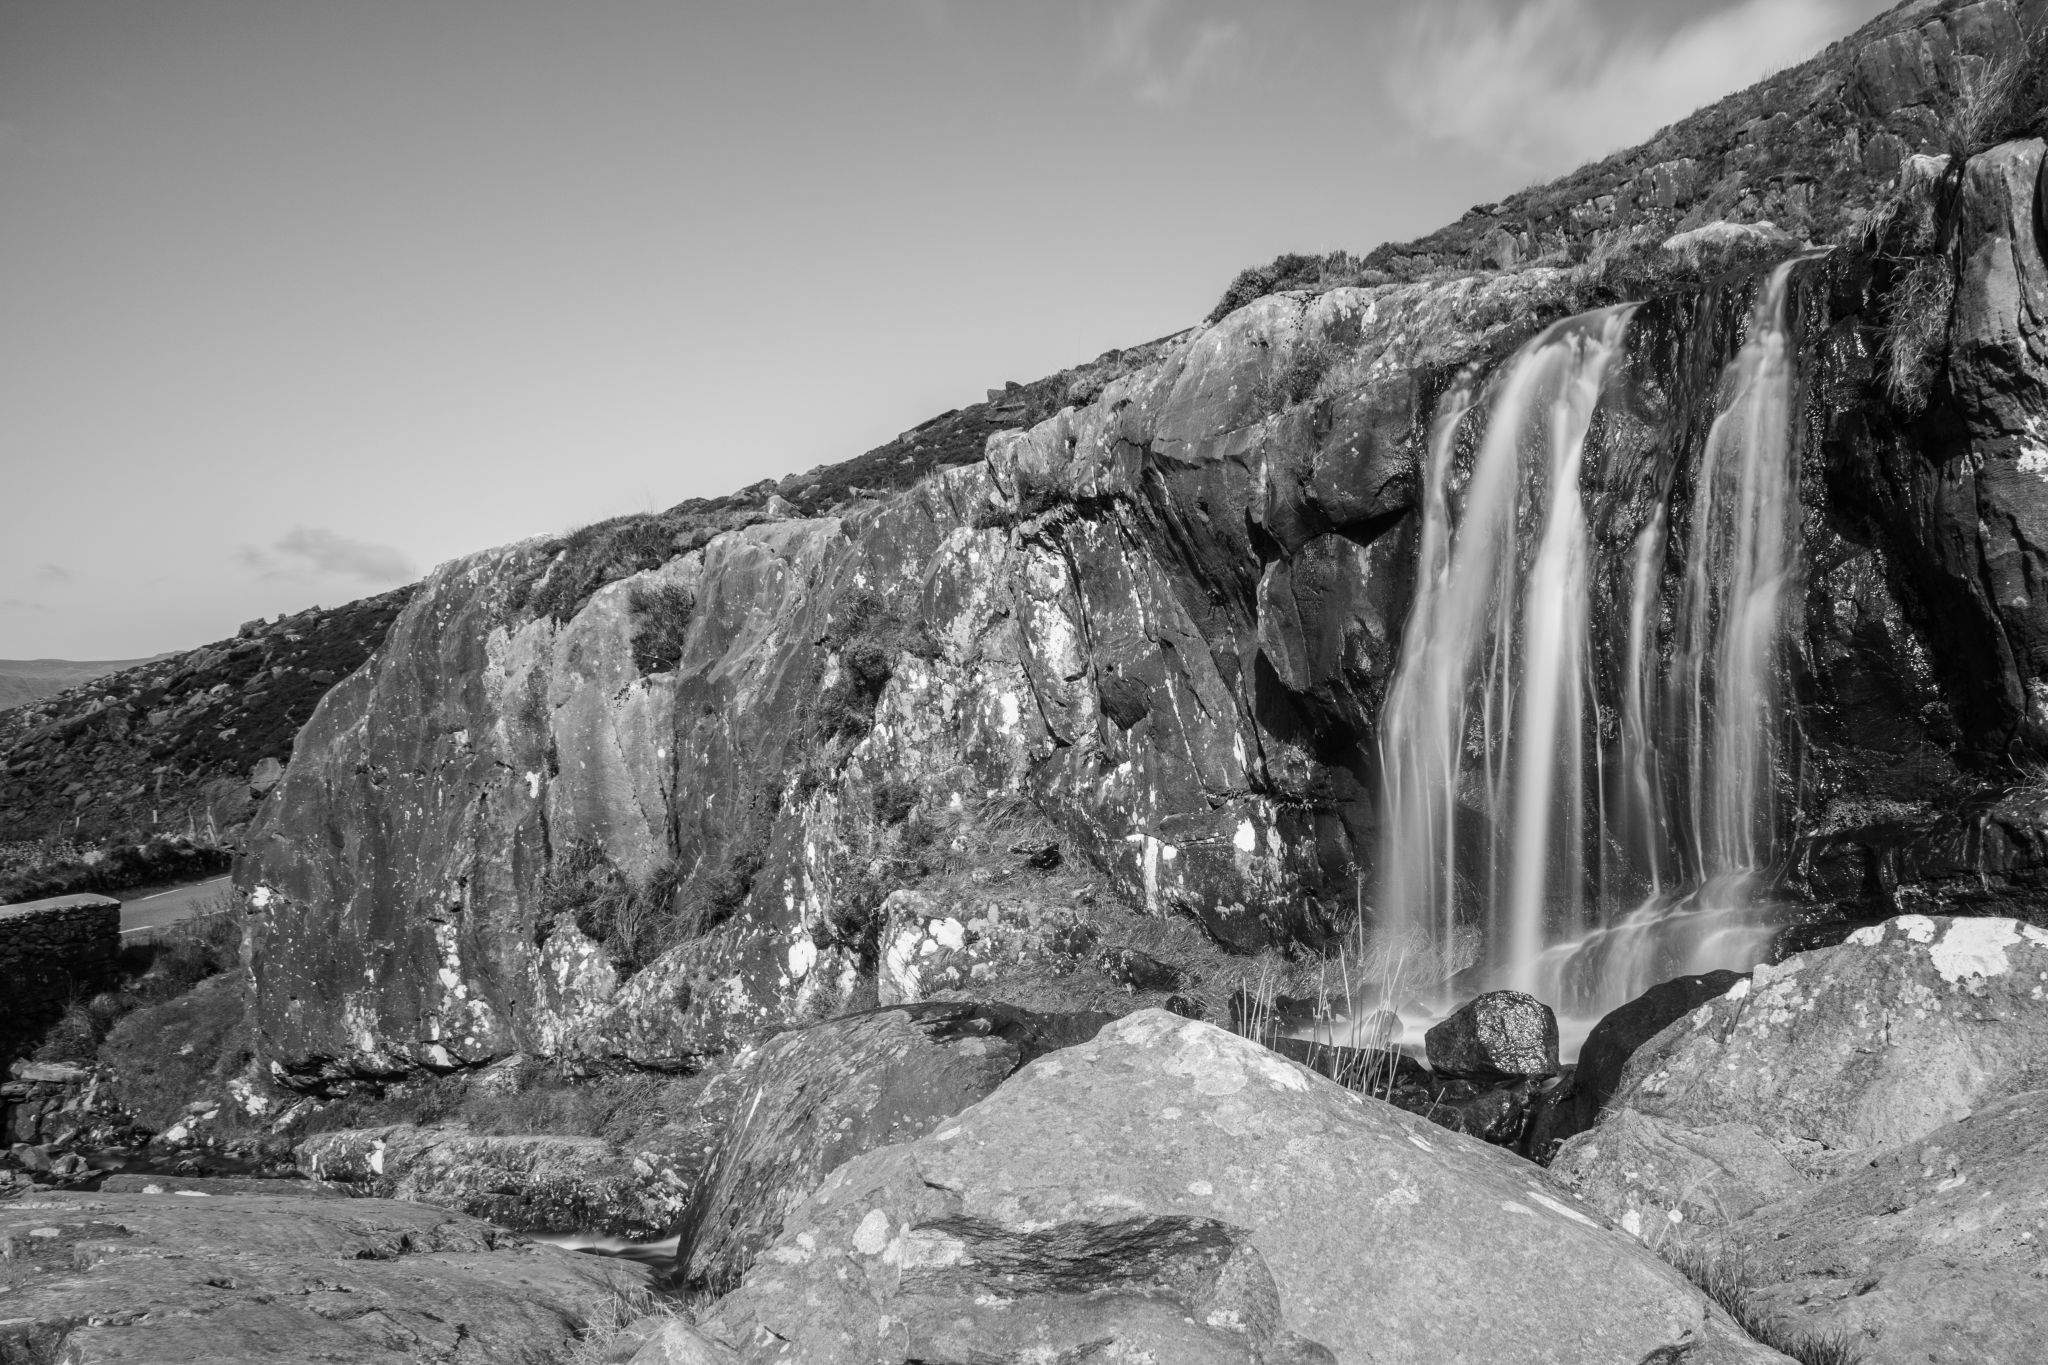 Waterfall near Conor Pass, Ireland